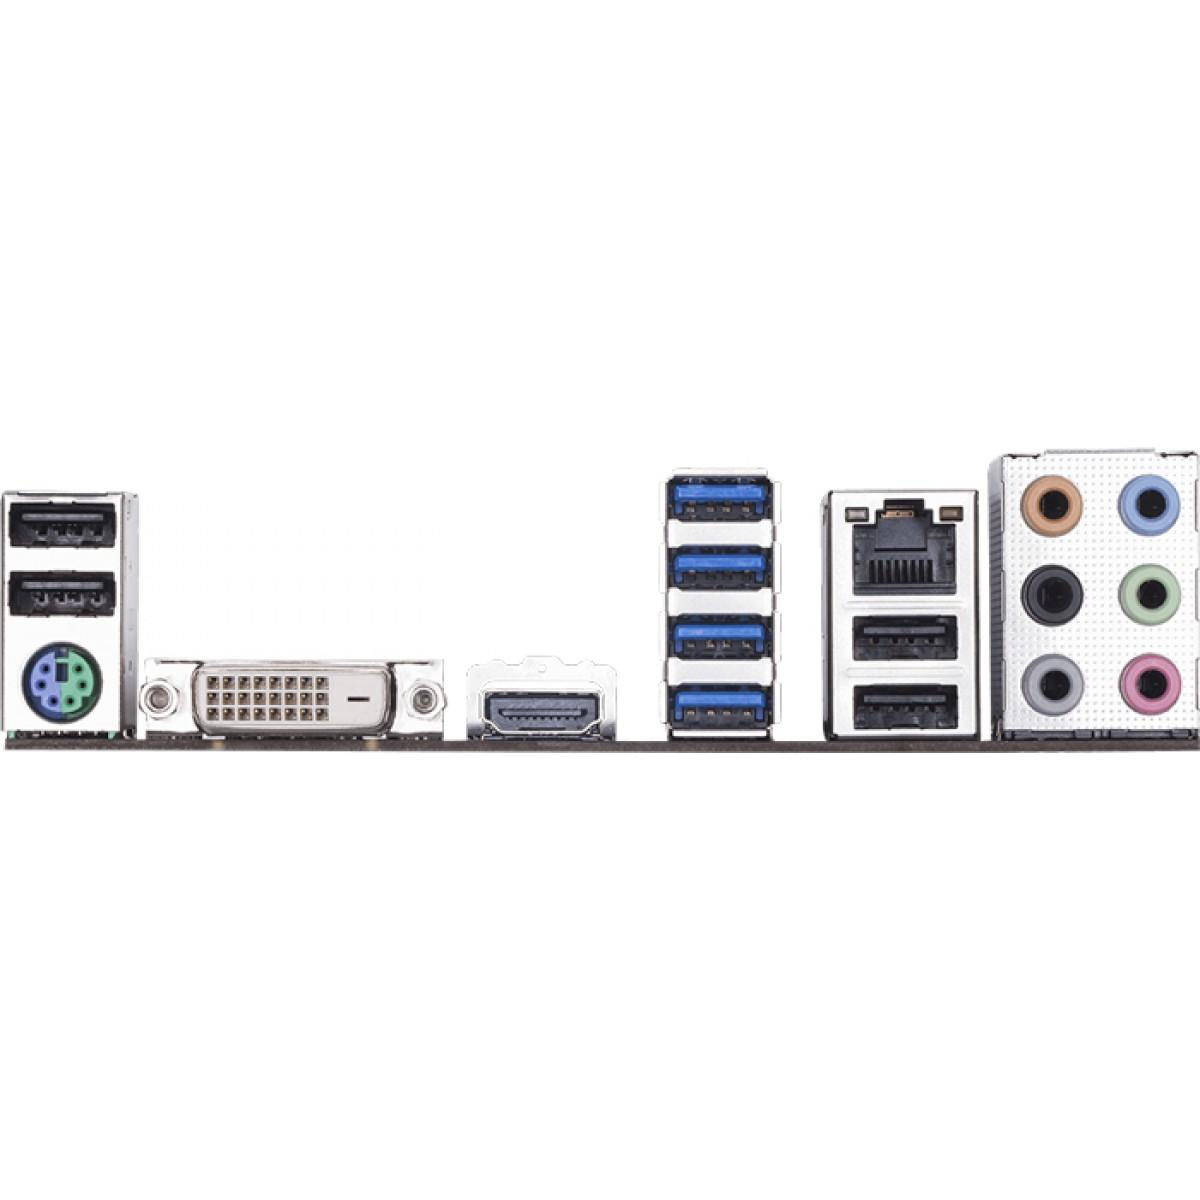 Placa Mãe Gigabyte B450 Gaming X, Chipset B450, AMD AM4, ATX, DDR4